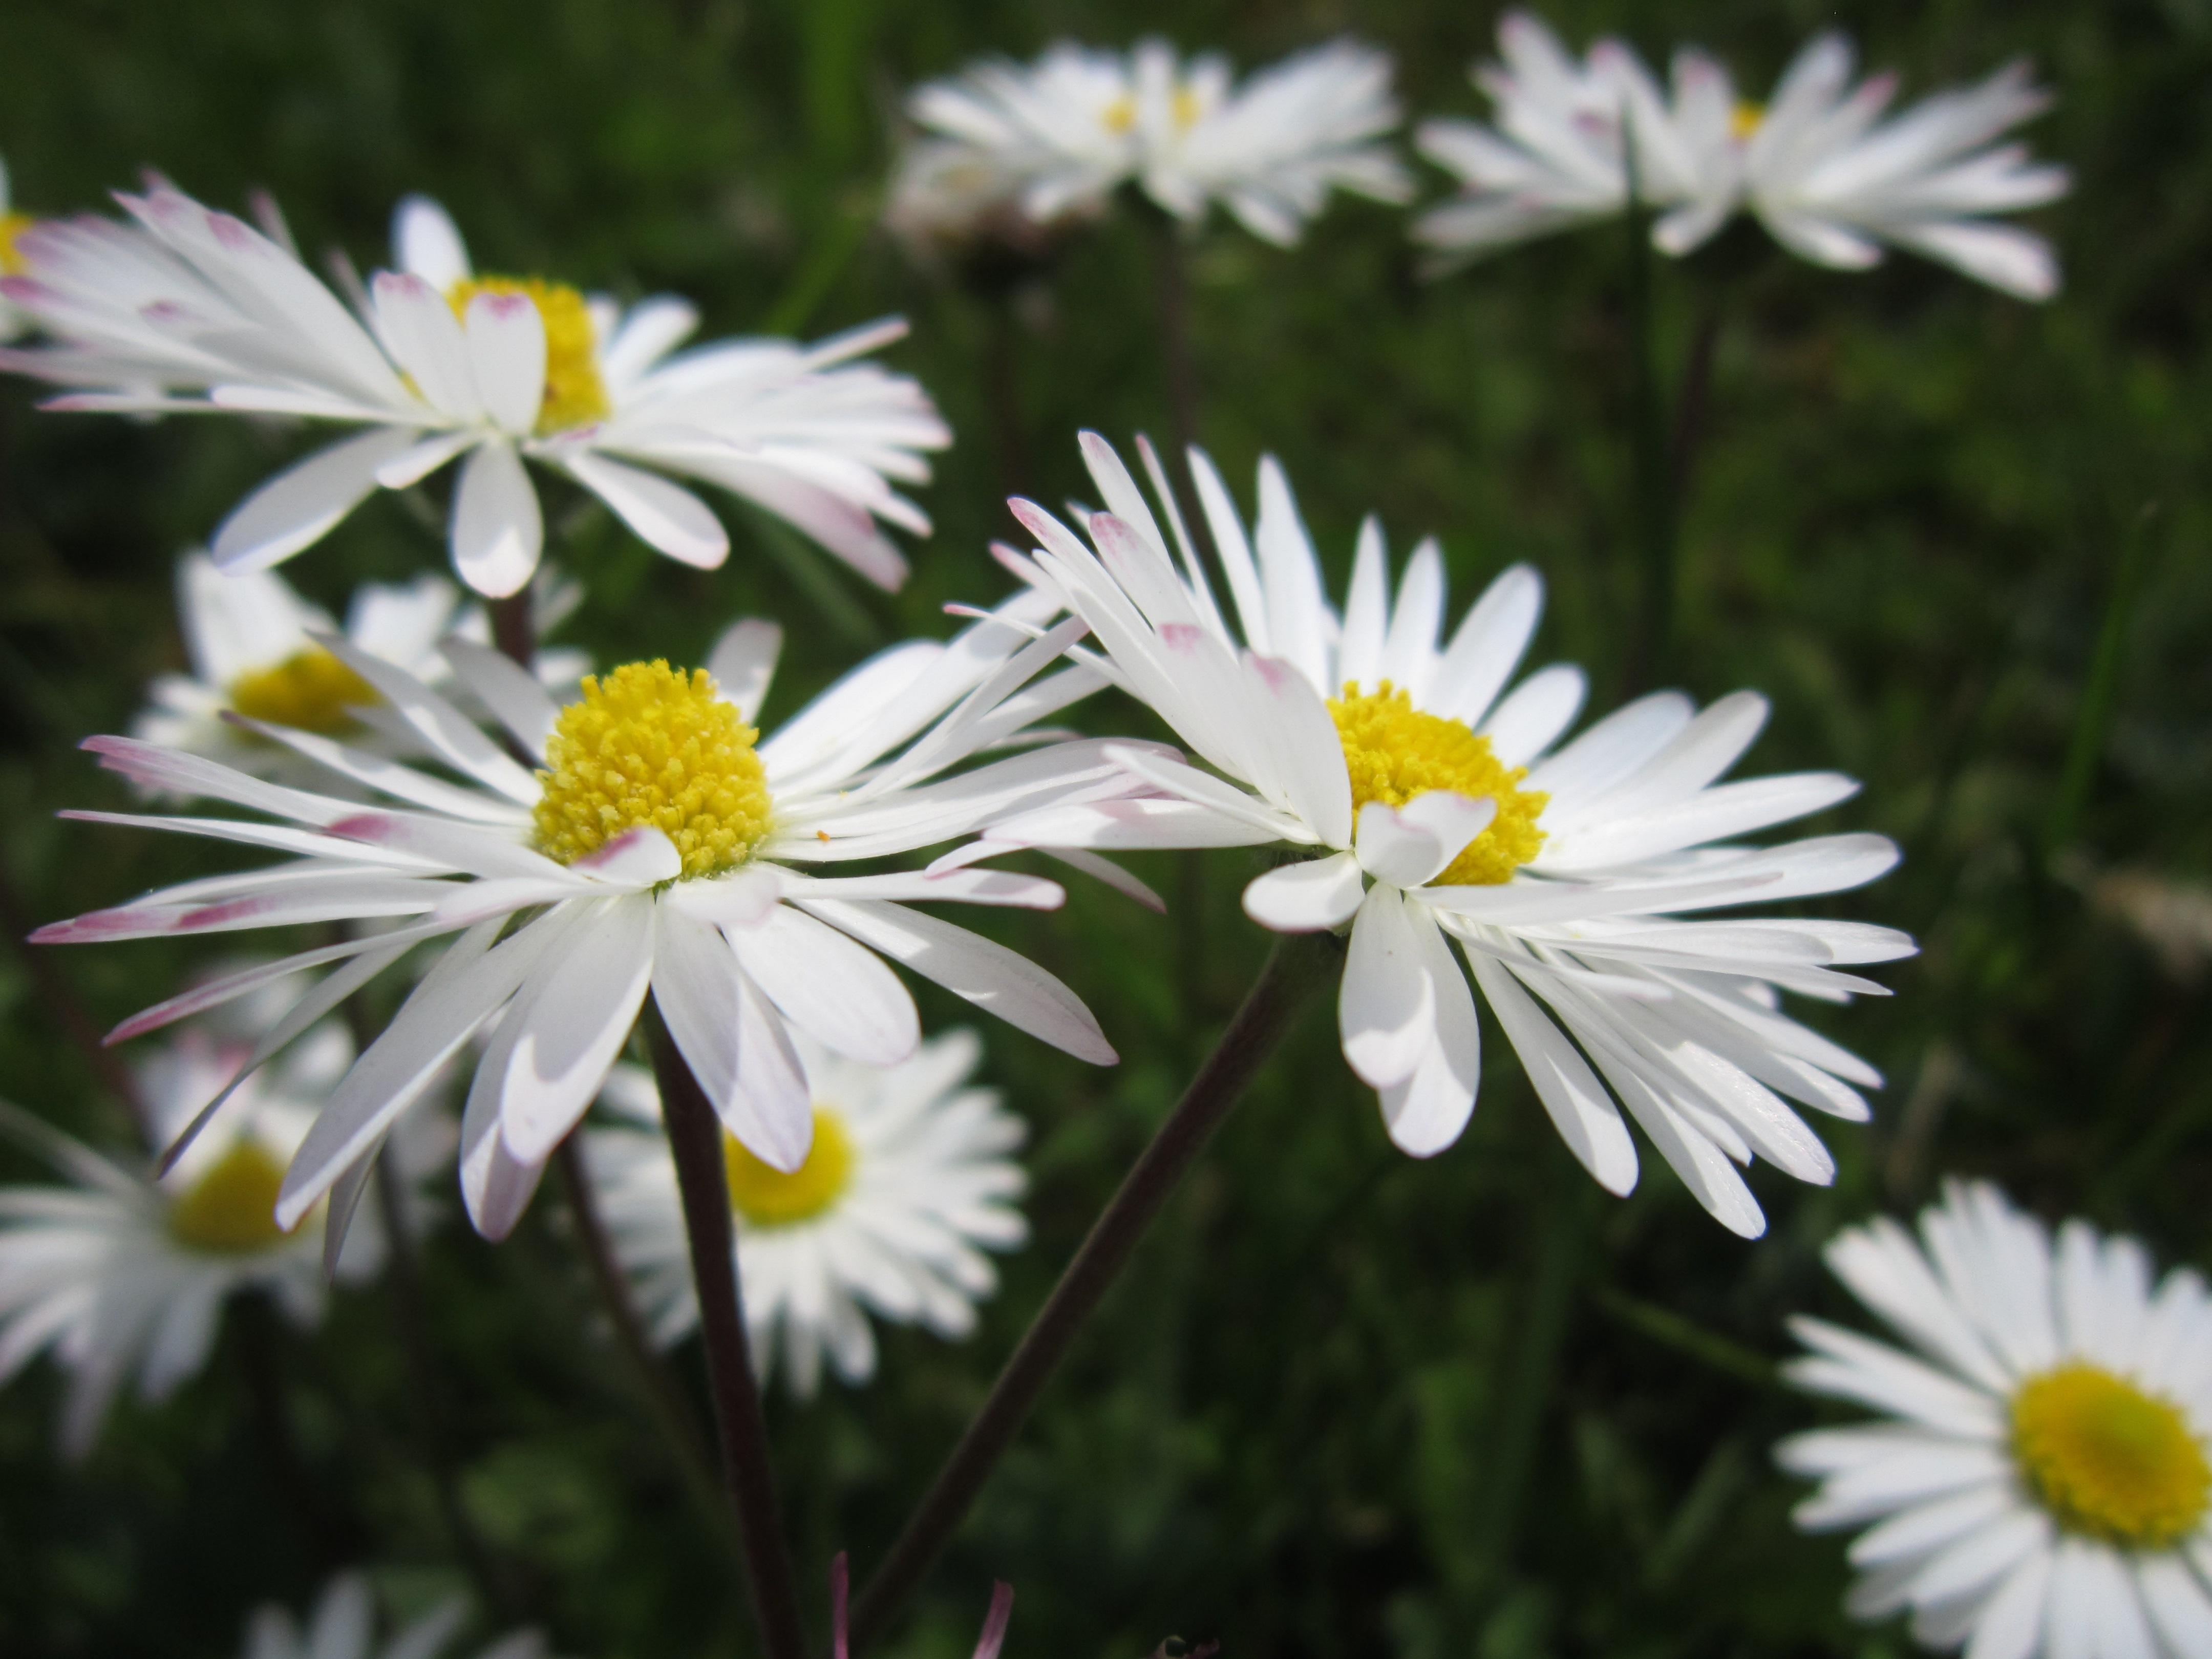 Free Images White Petal Spring Green Botany Flora Wildflower